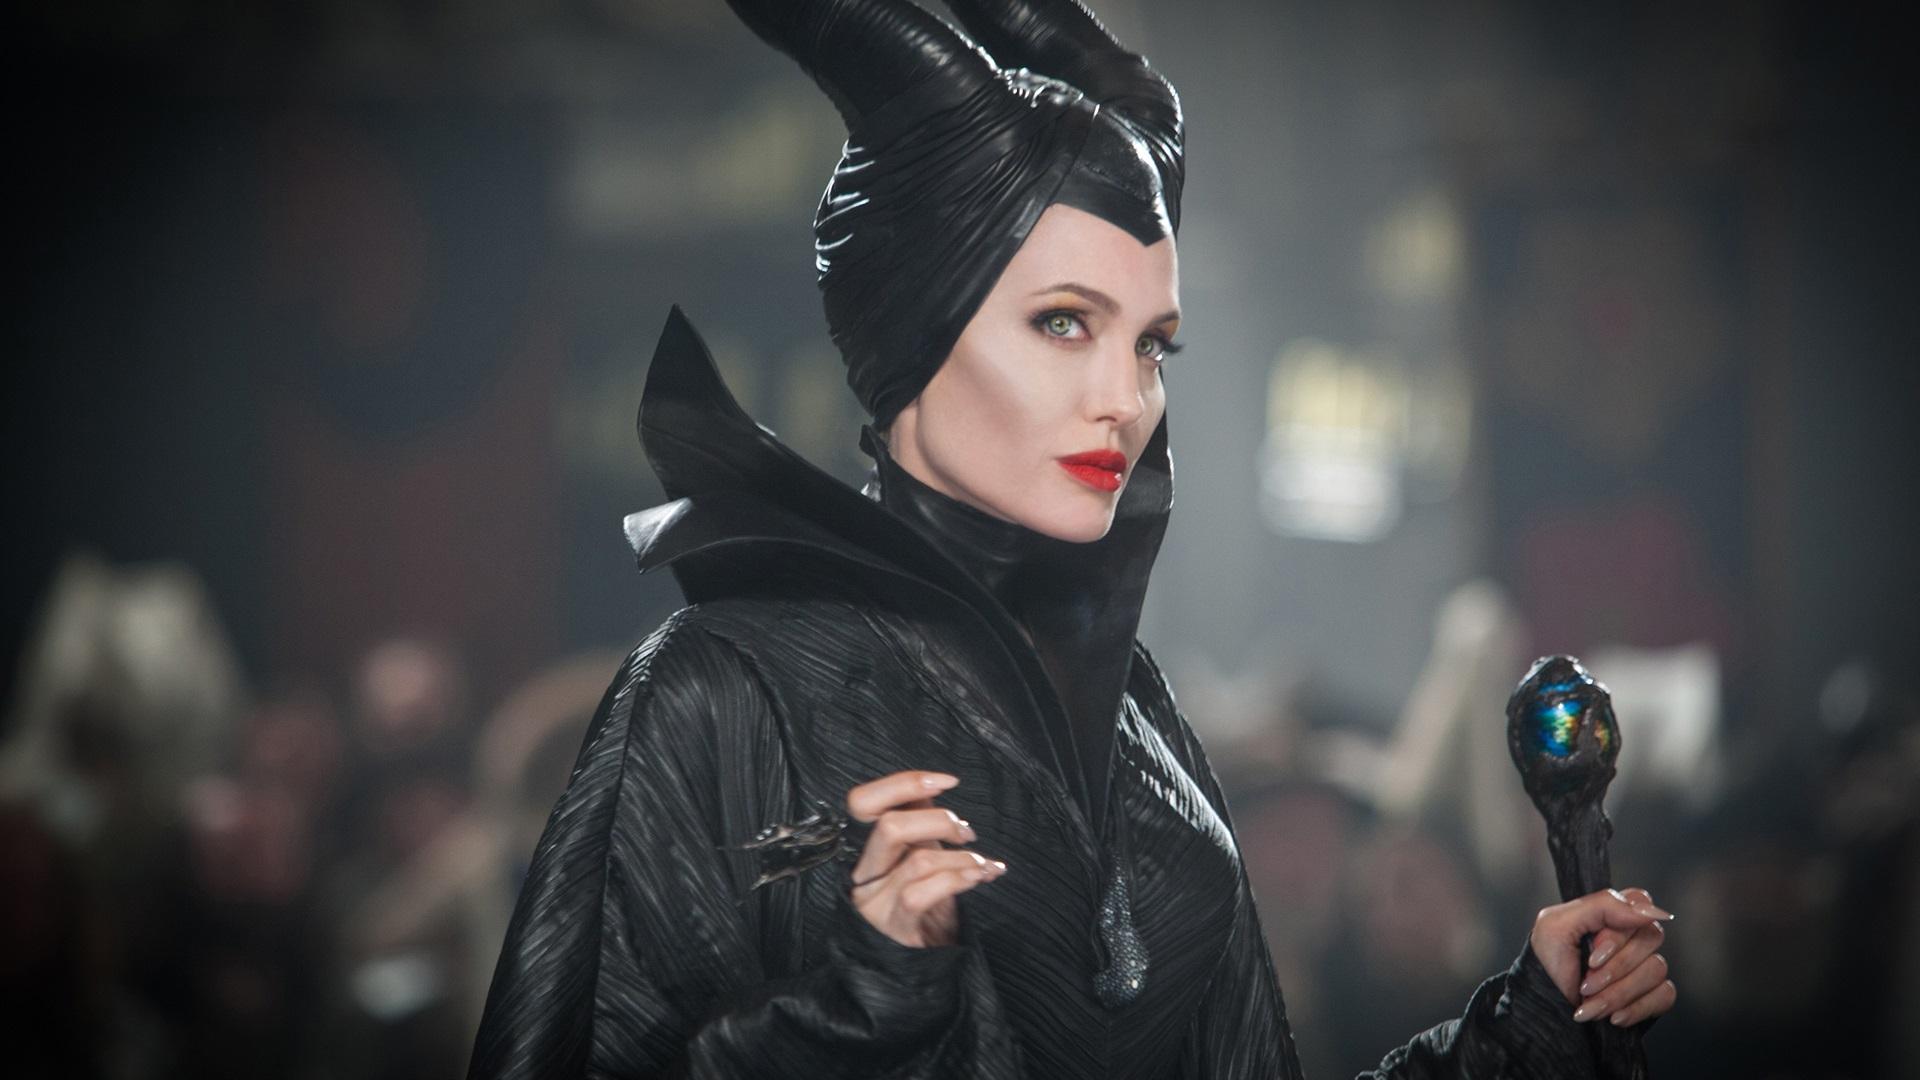 Angelina Jolie Bruja Vestido Negro Maleficent 640x1136